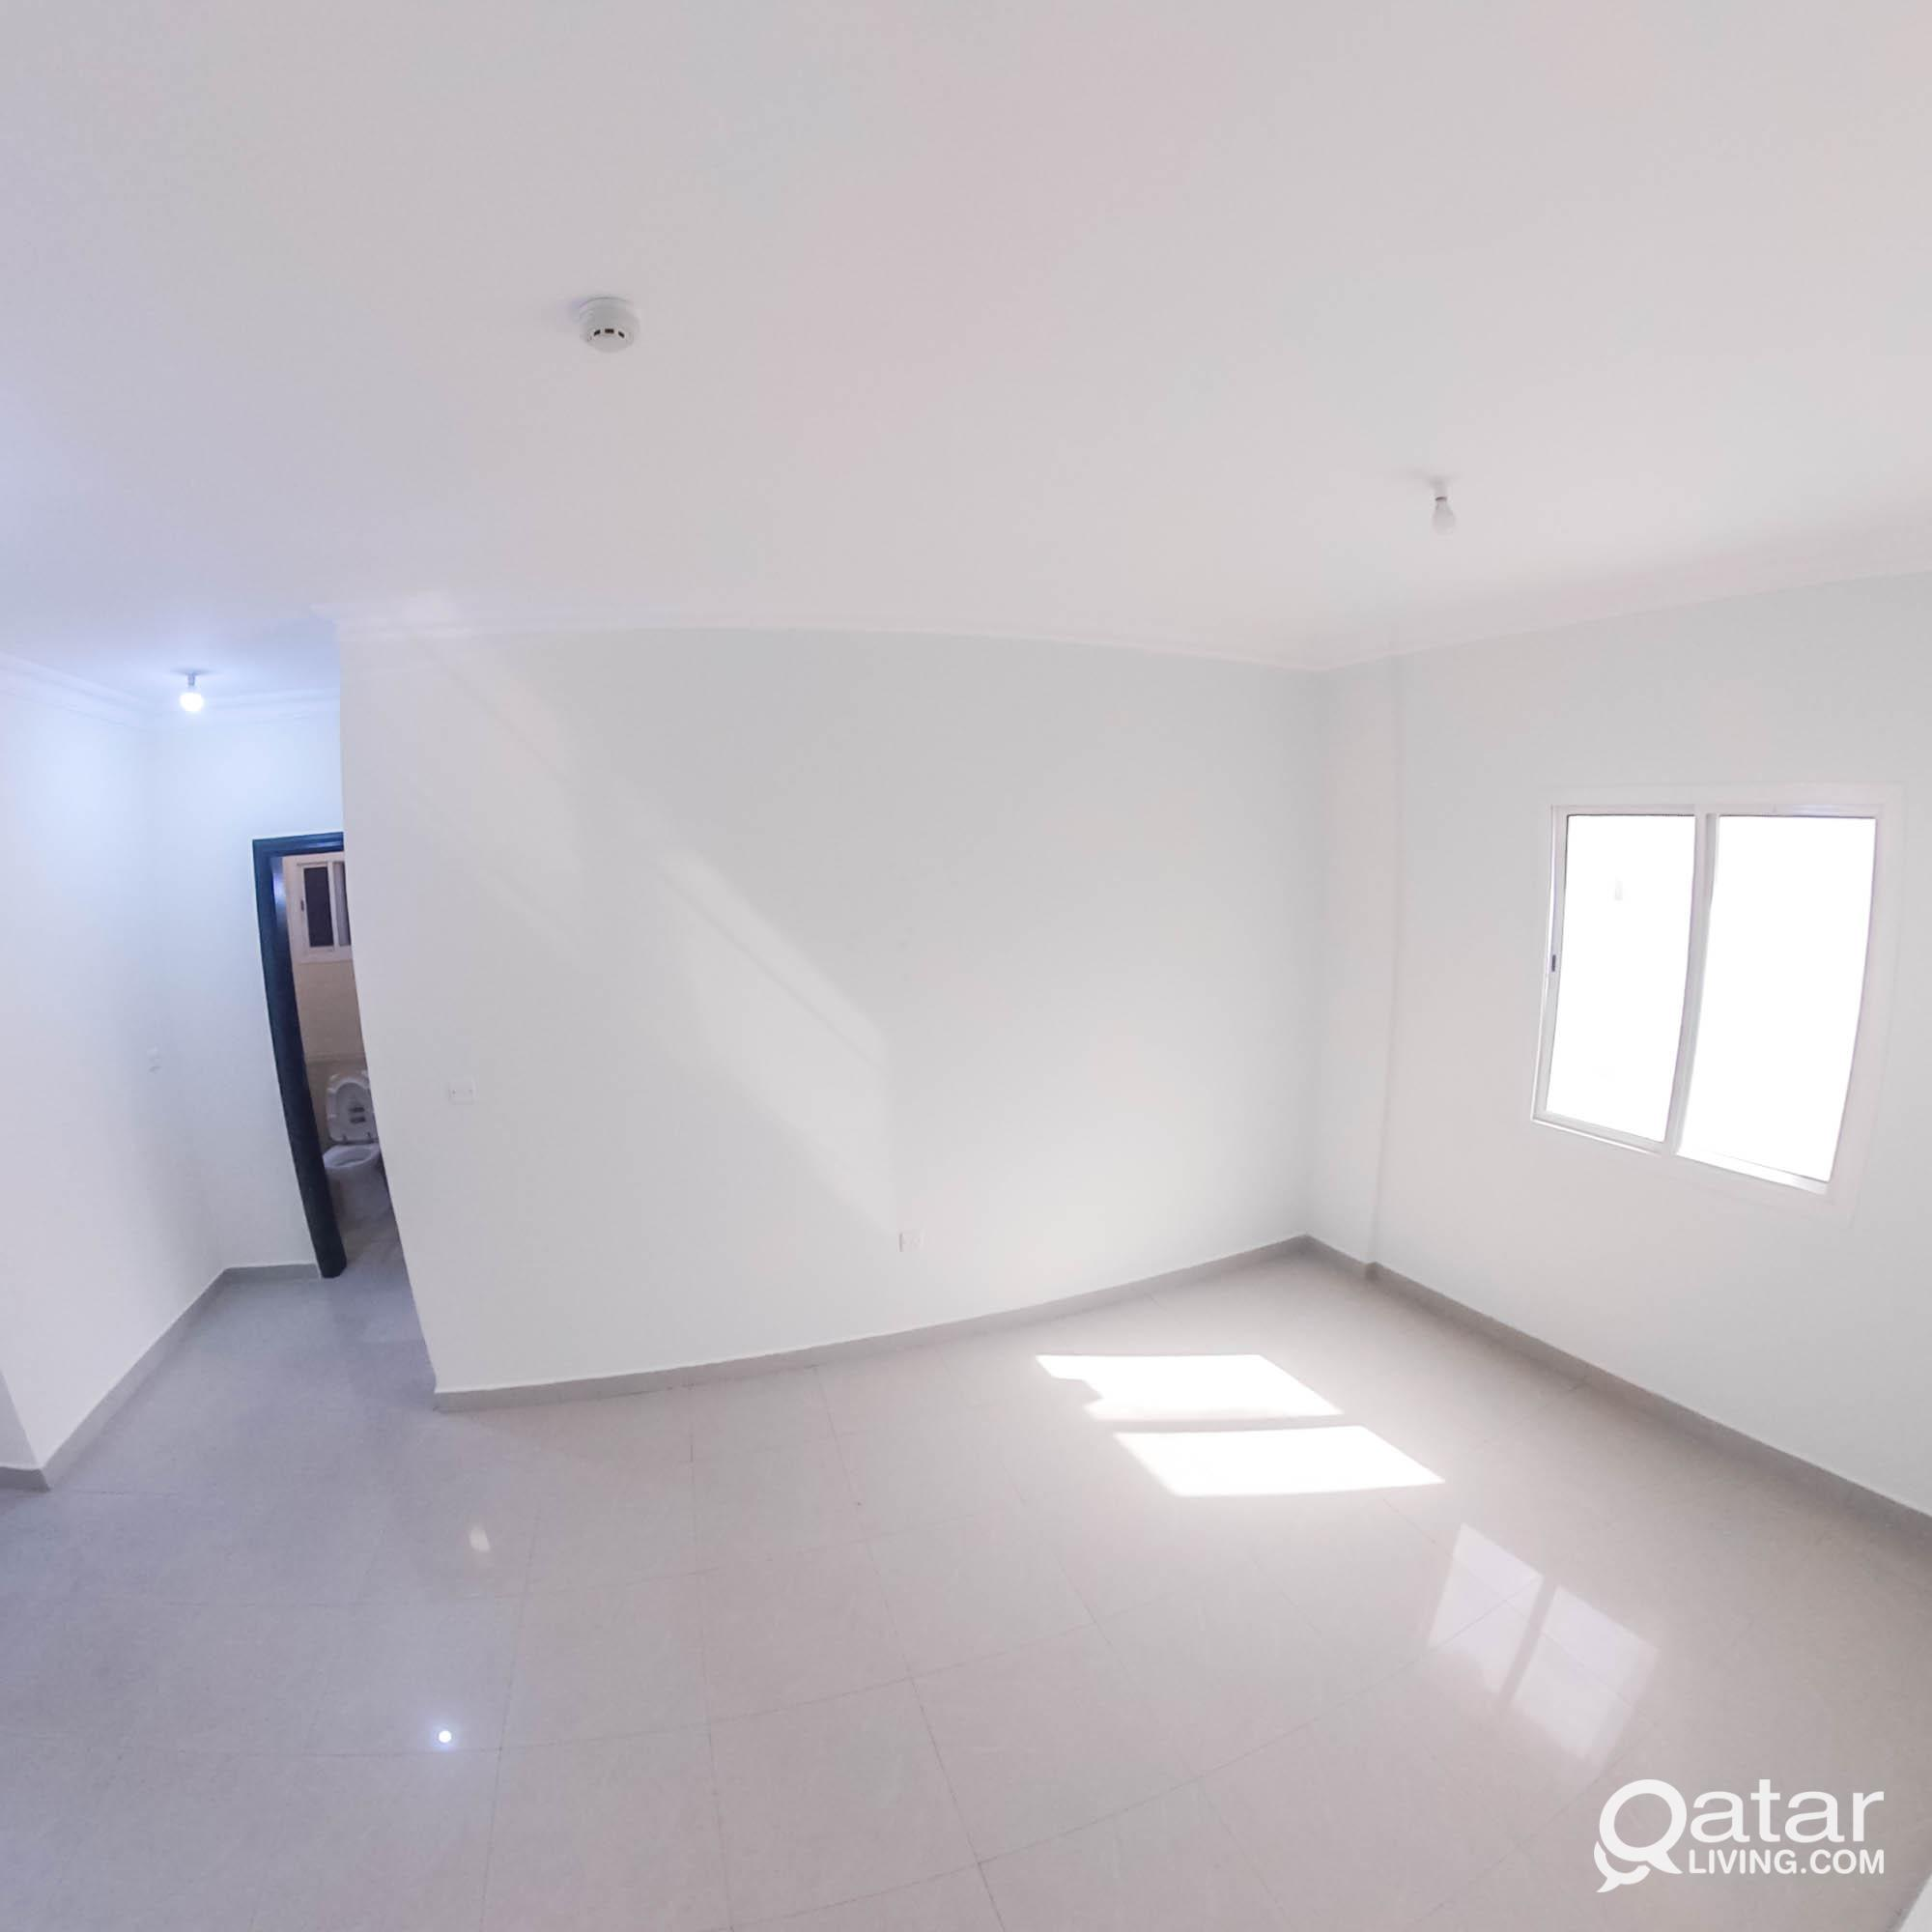 Unfurnished, 1 BHK Apartment in Umm Ghuwailina 3,0